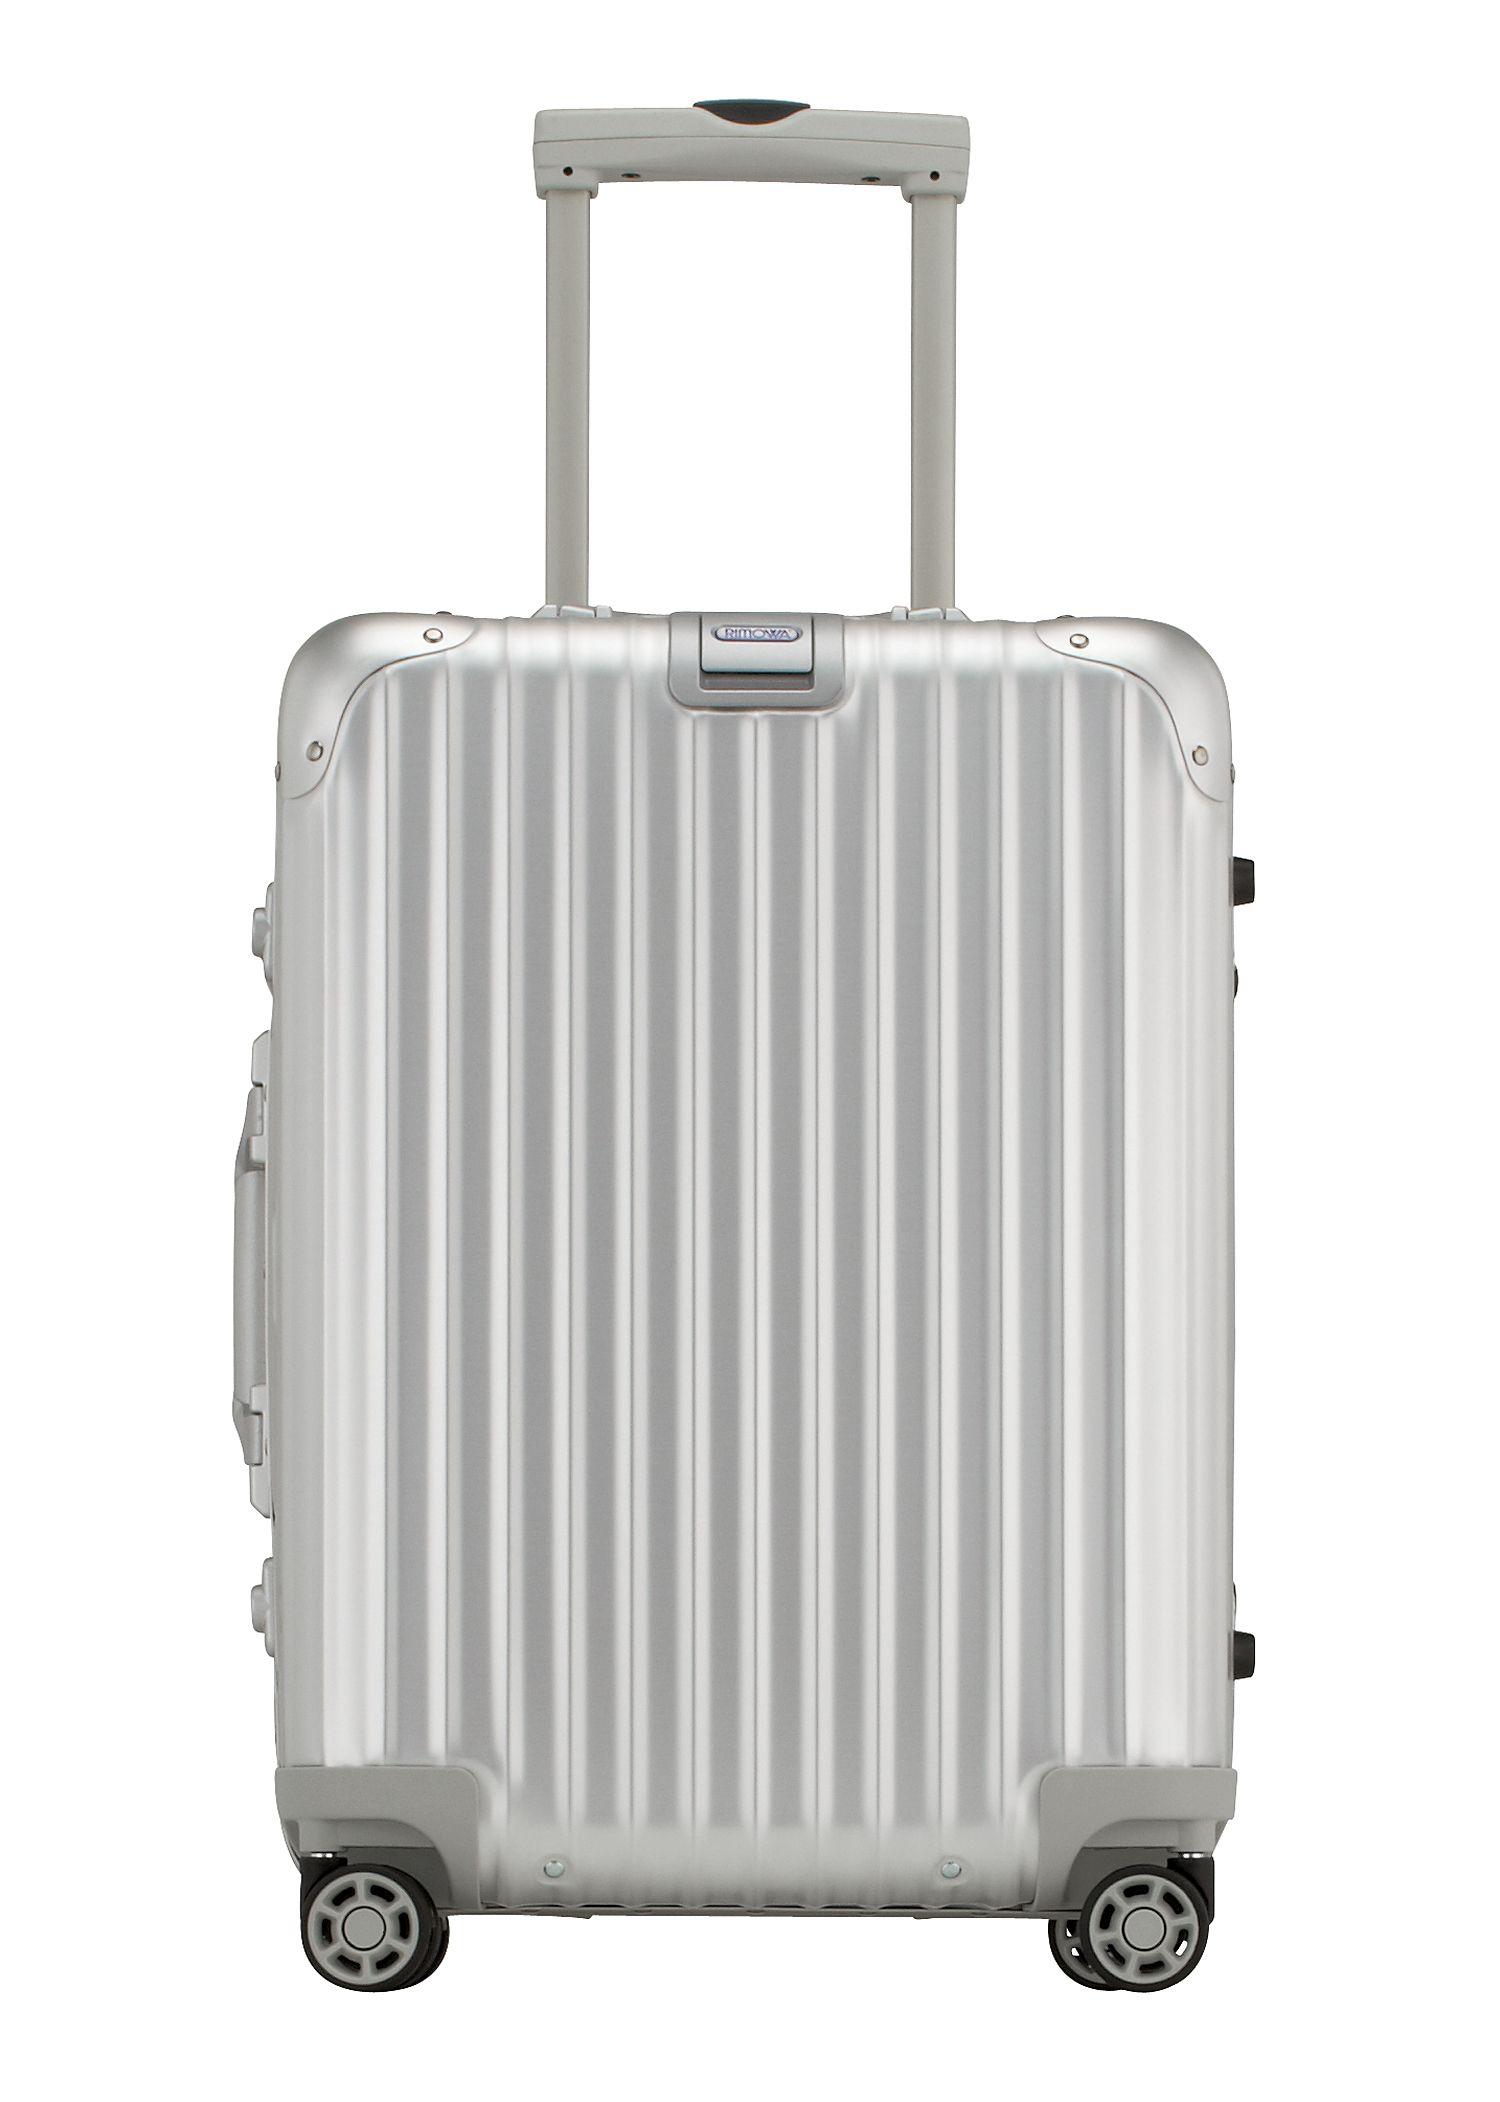 rimowa topas cabin multiwheel iata 52 koffer trolleys. Black Bedroom Furniture Sets. Home Design Ideas